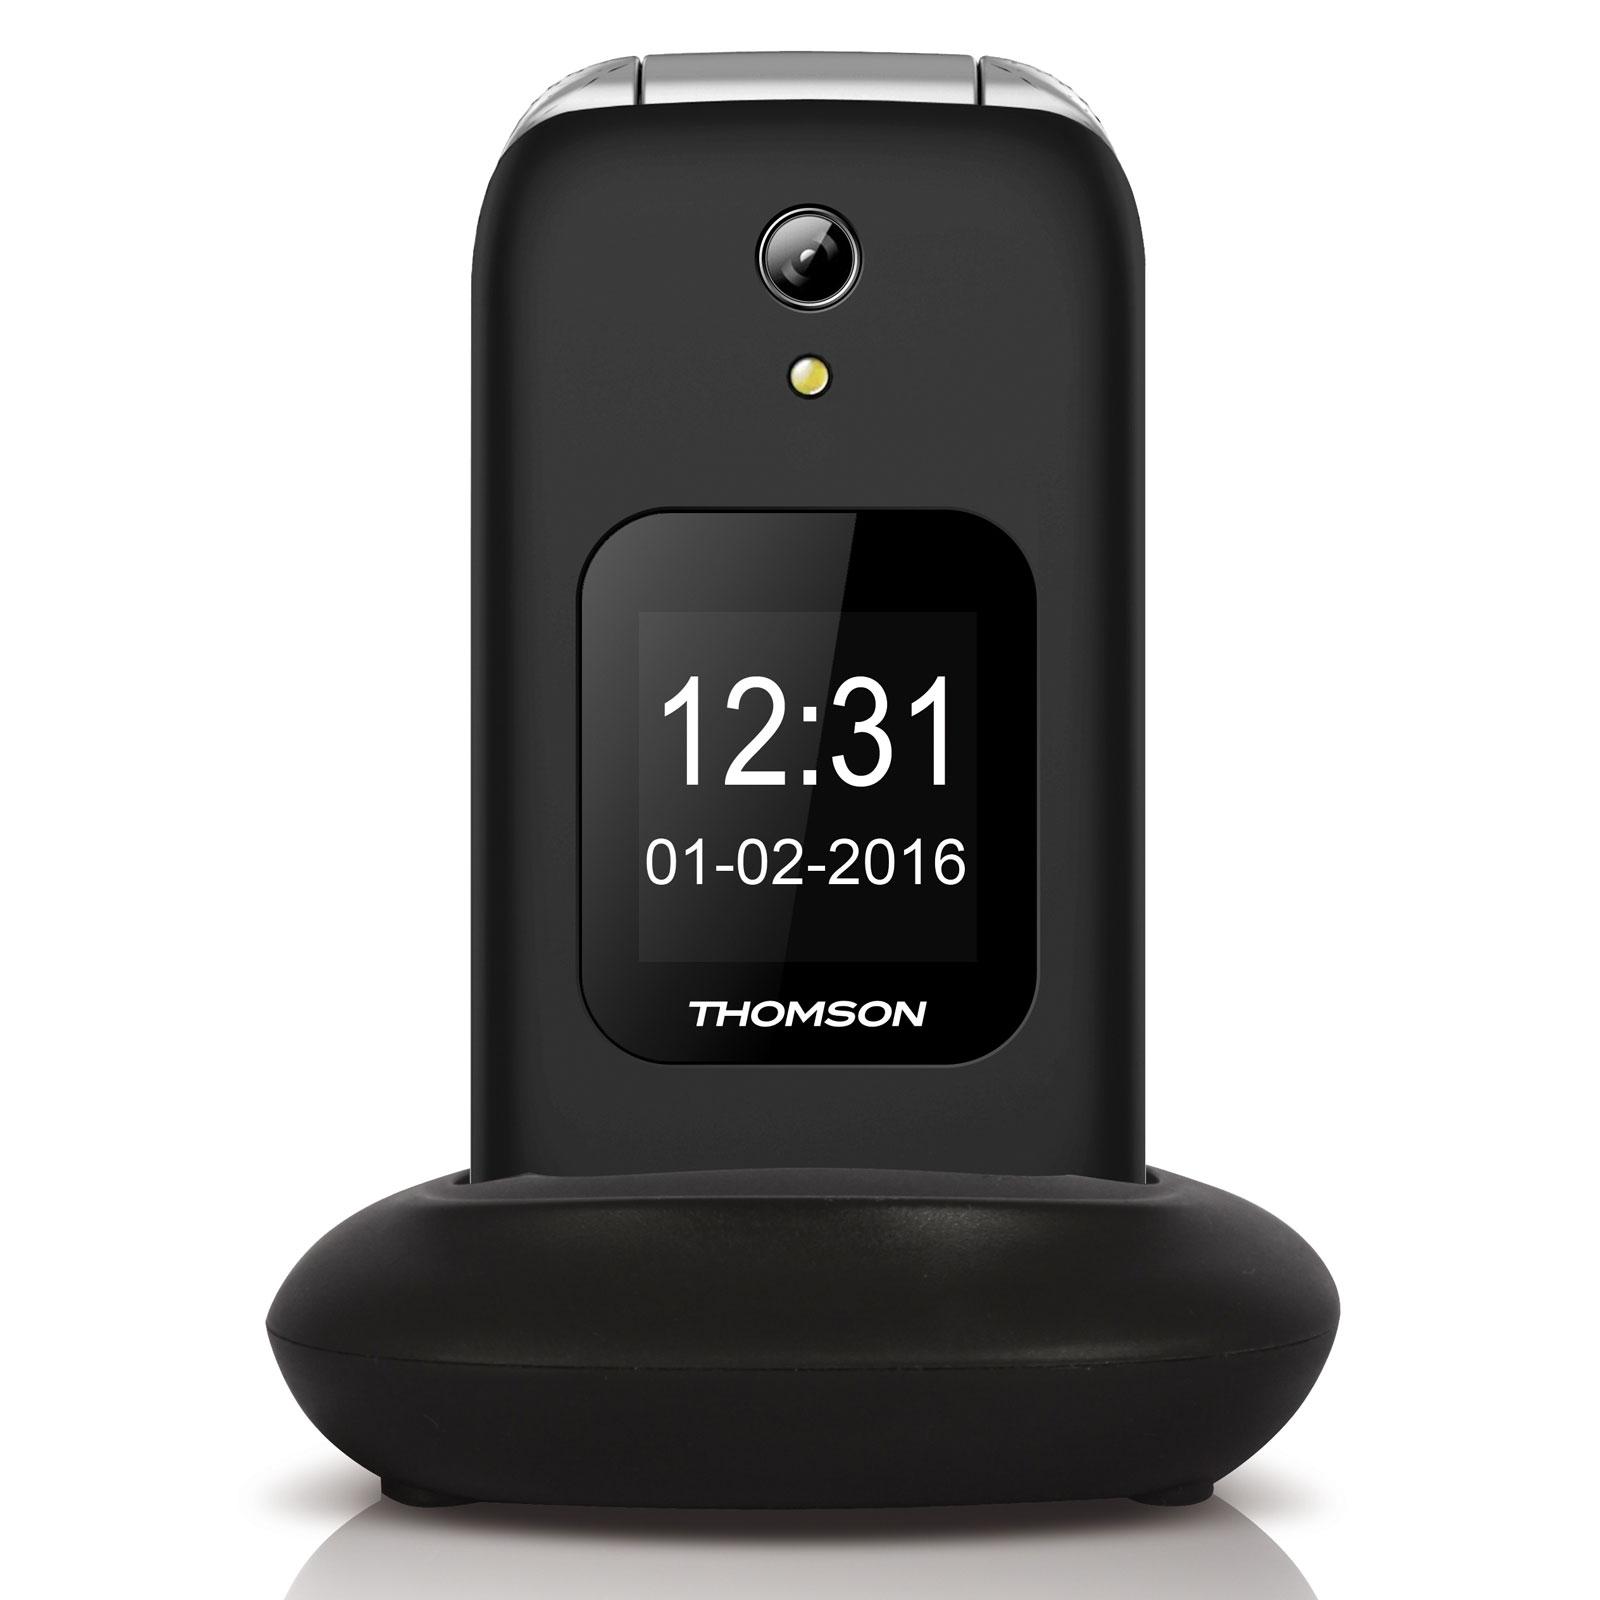 Thomson serea 66 noir mobile smartphone thomson sur for Photo ecran telephone